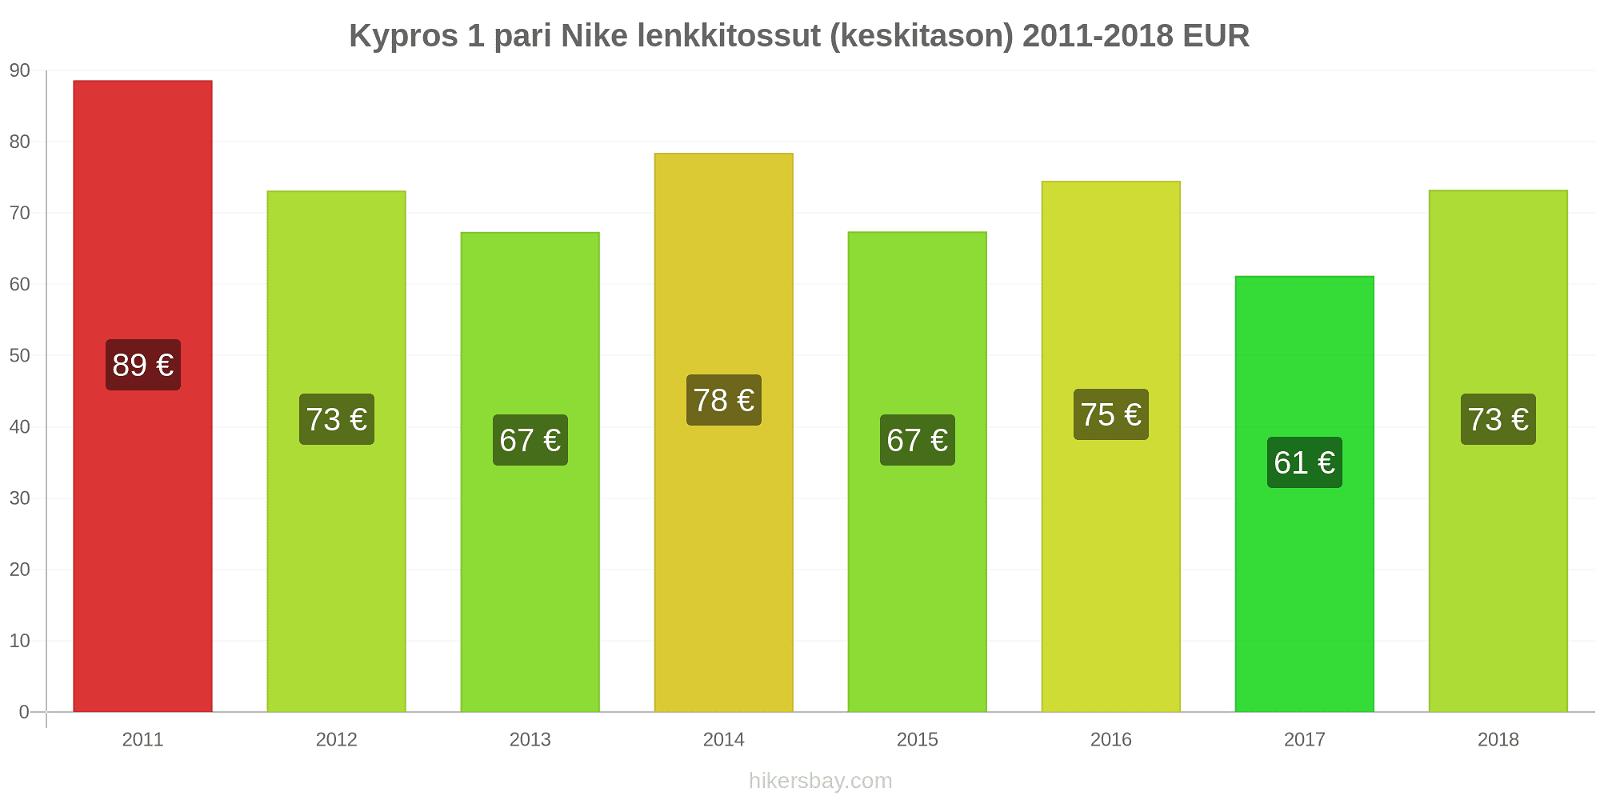 Kypros hintojen muutokset 1 pari Nike lenkkitossut (keskitason) hikersbay.com